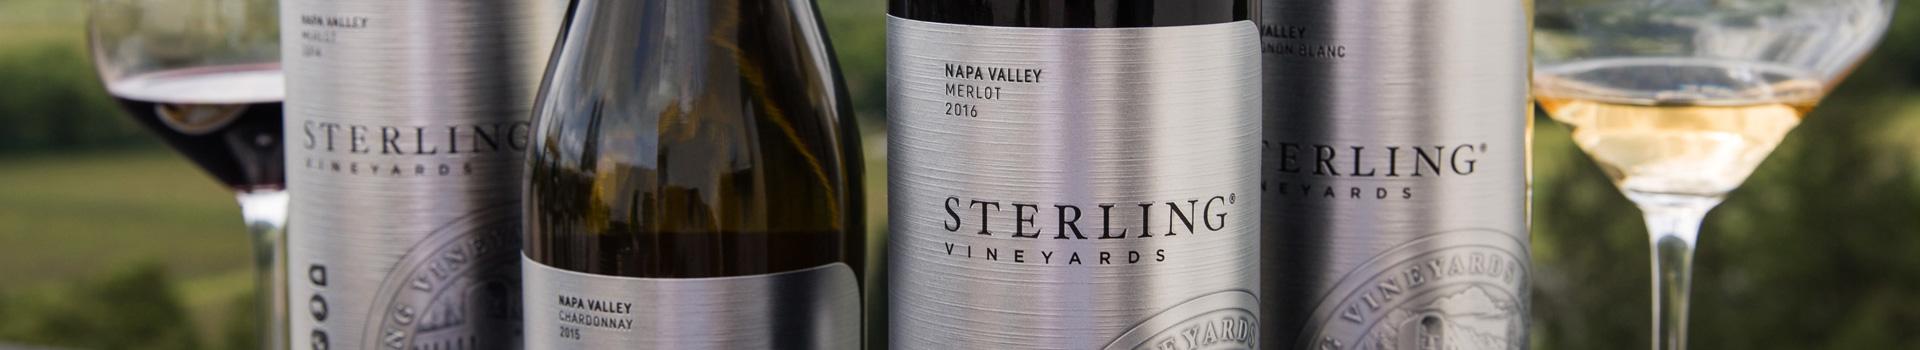 Sterling Napa Valley Wines - Merlot, Sauvignon Blanc, & Chardonnay